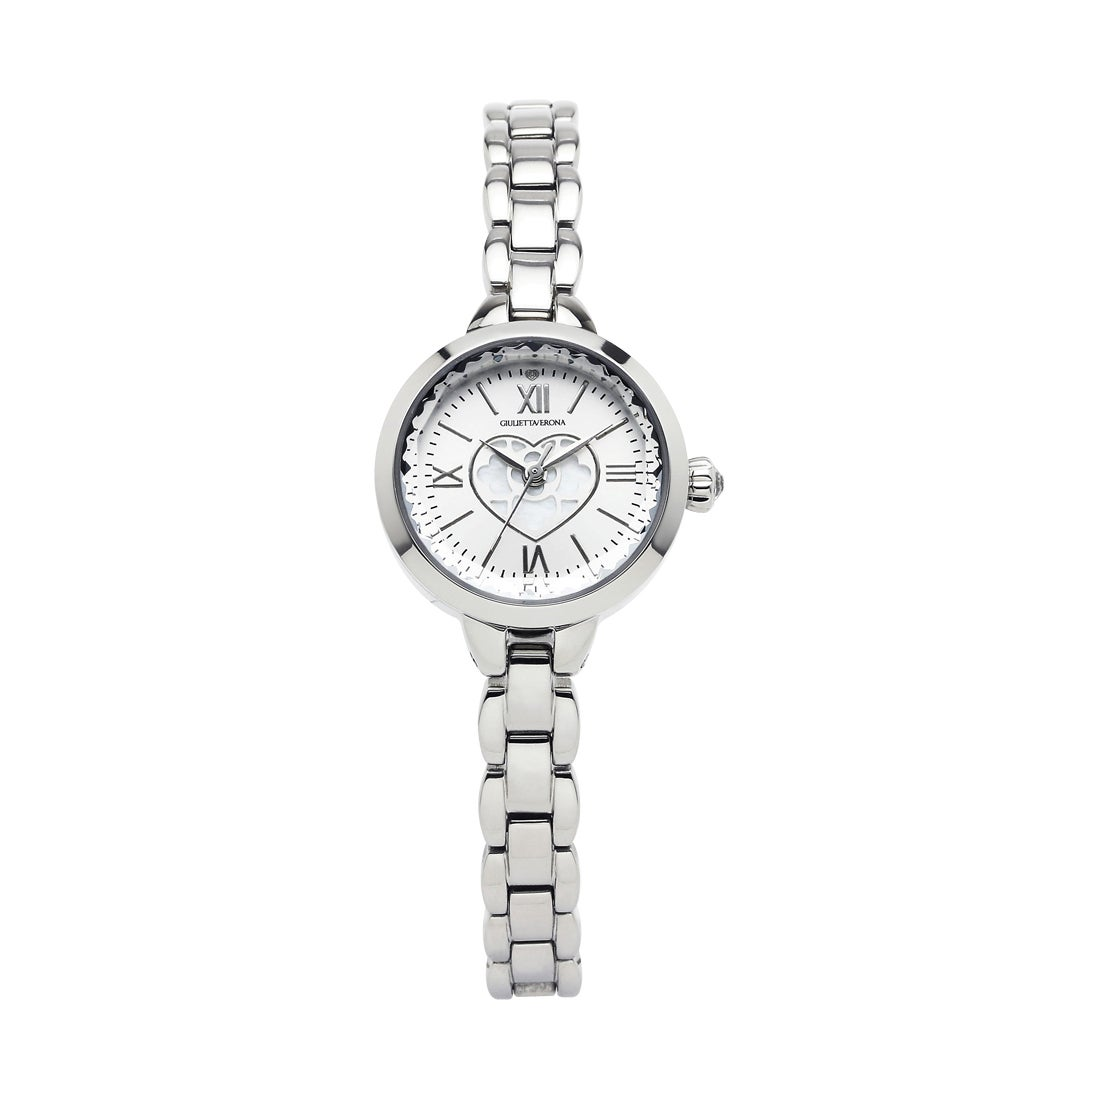 【SAC'S BAR】ジュリエッタヴェローナ GIULIETTAVERONA 腕時計 GV004S PURE GIULIETTA シルバー×シルバー